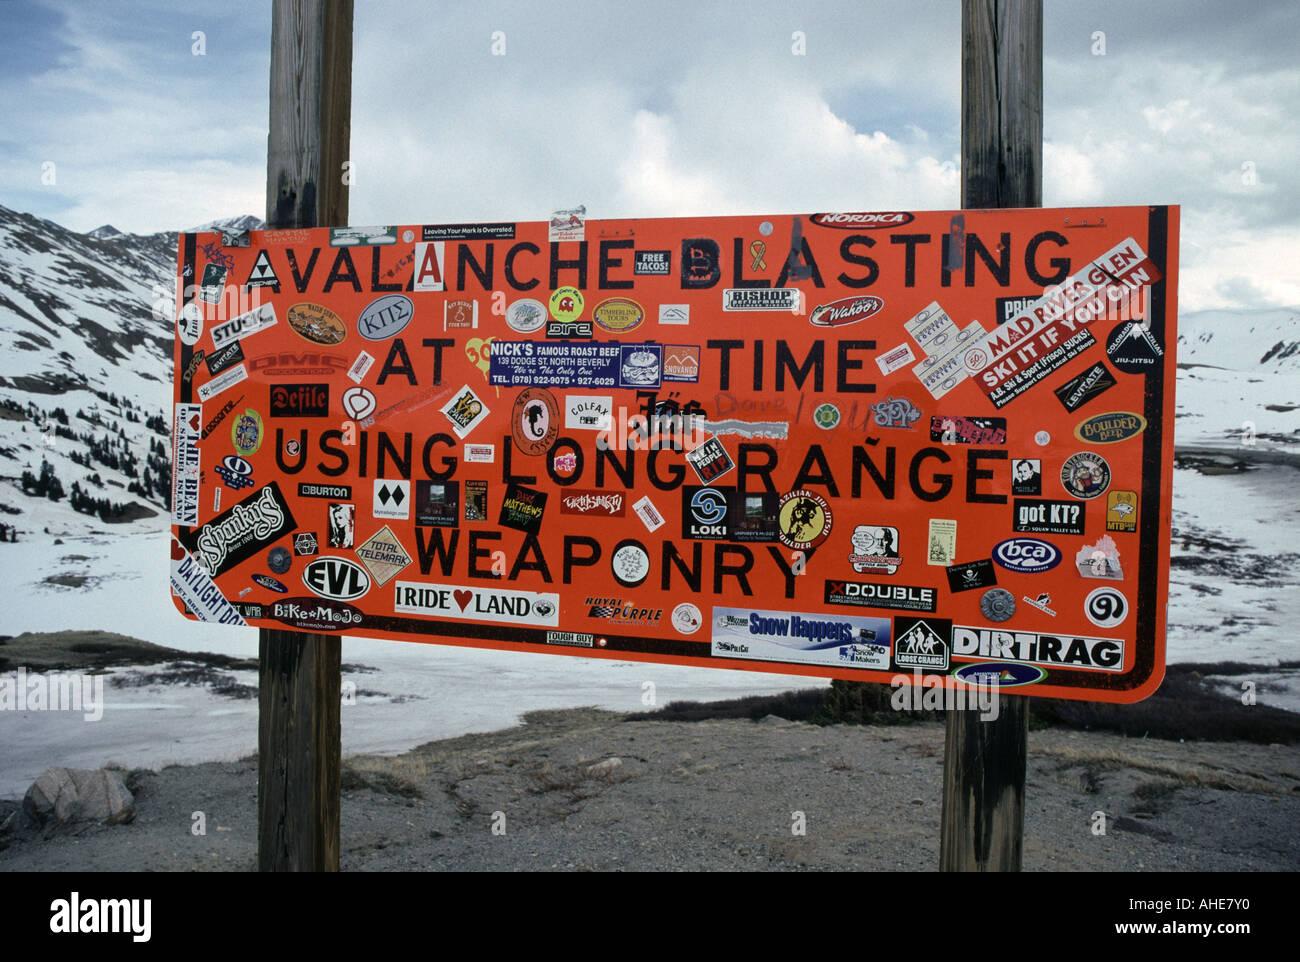 Avalanche blasting warning signpost with graffitti stickers Loveland Pass Highway 6 Colorado USA - Stock Image